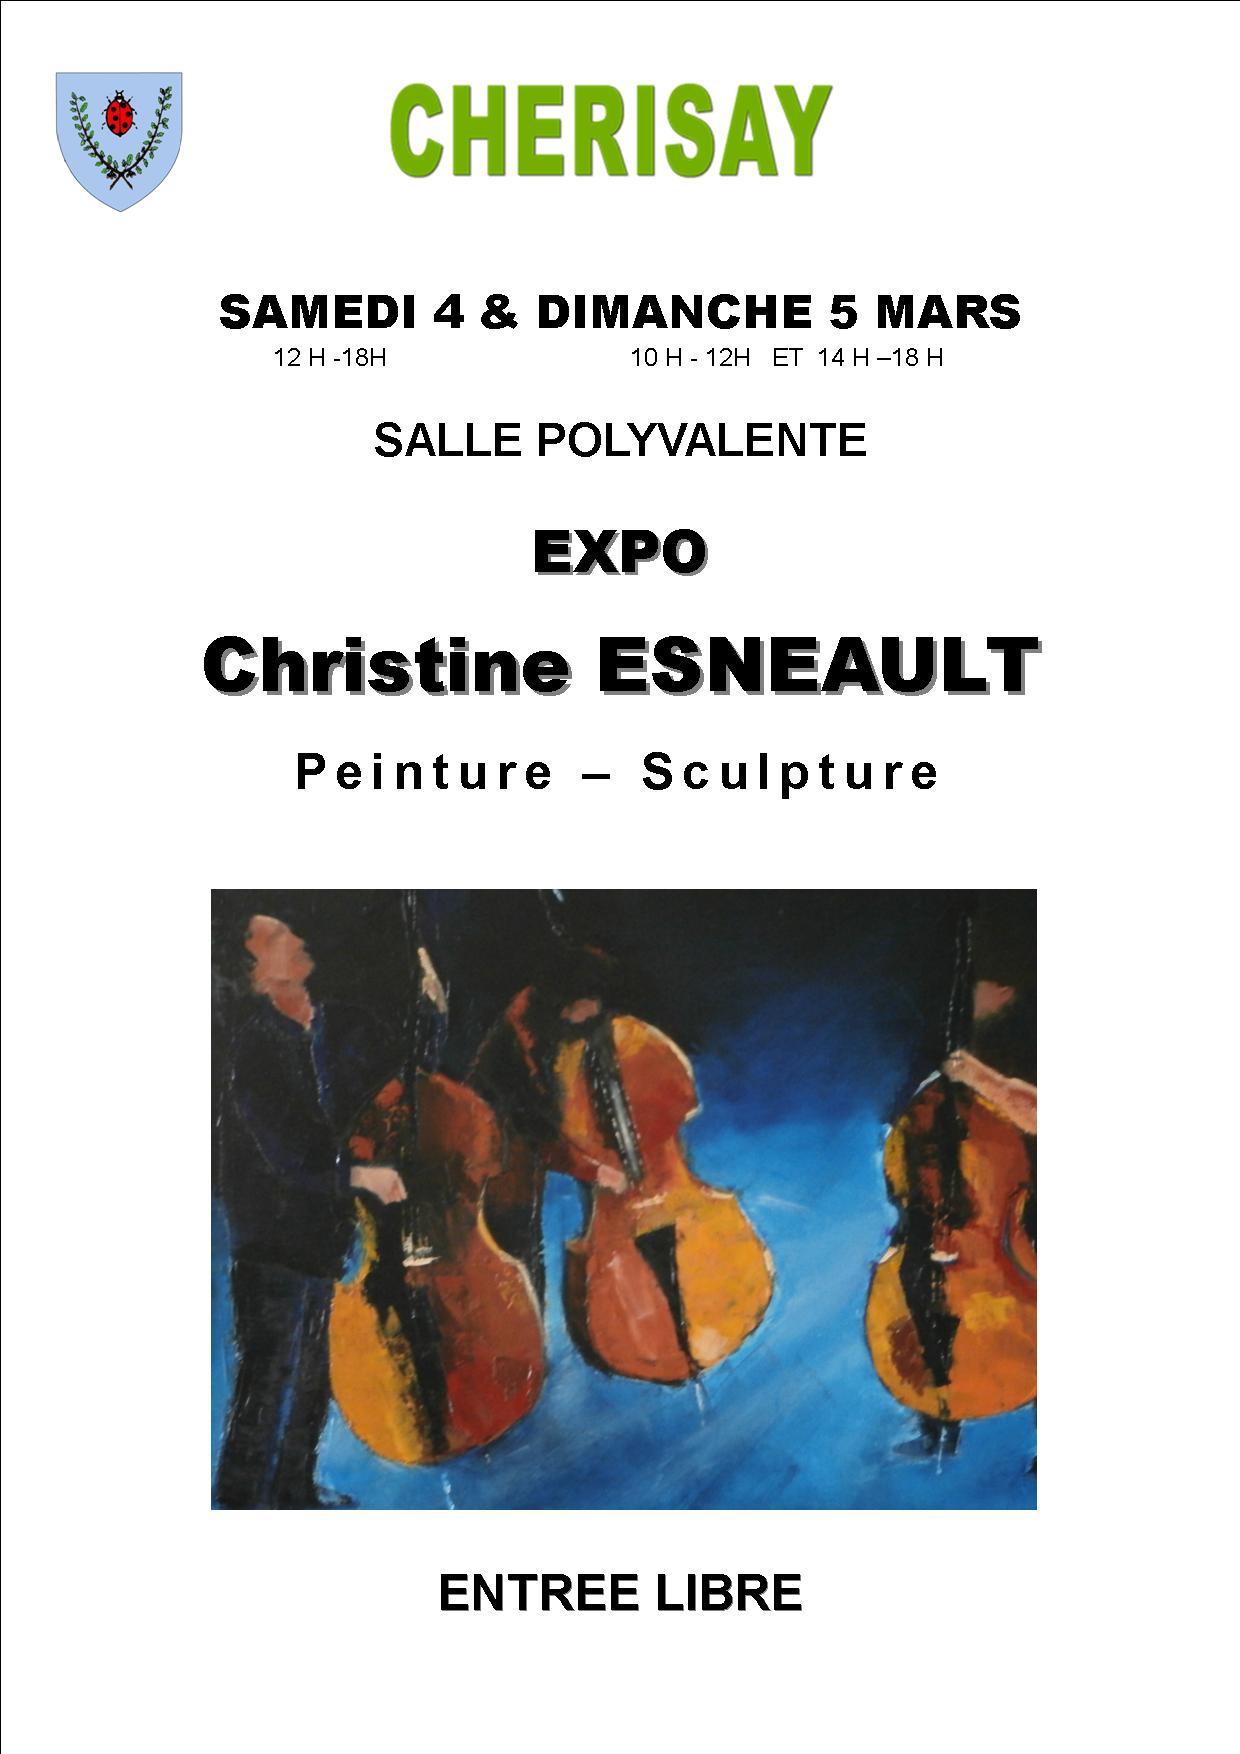 Expo Christine Esneault